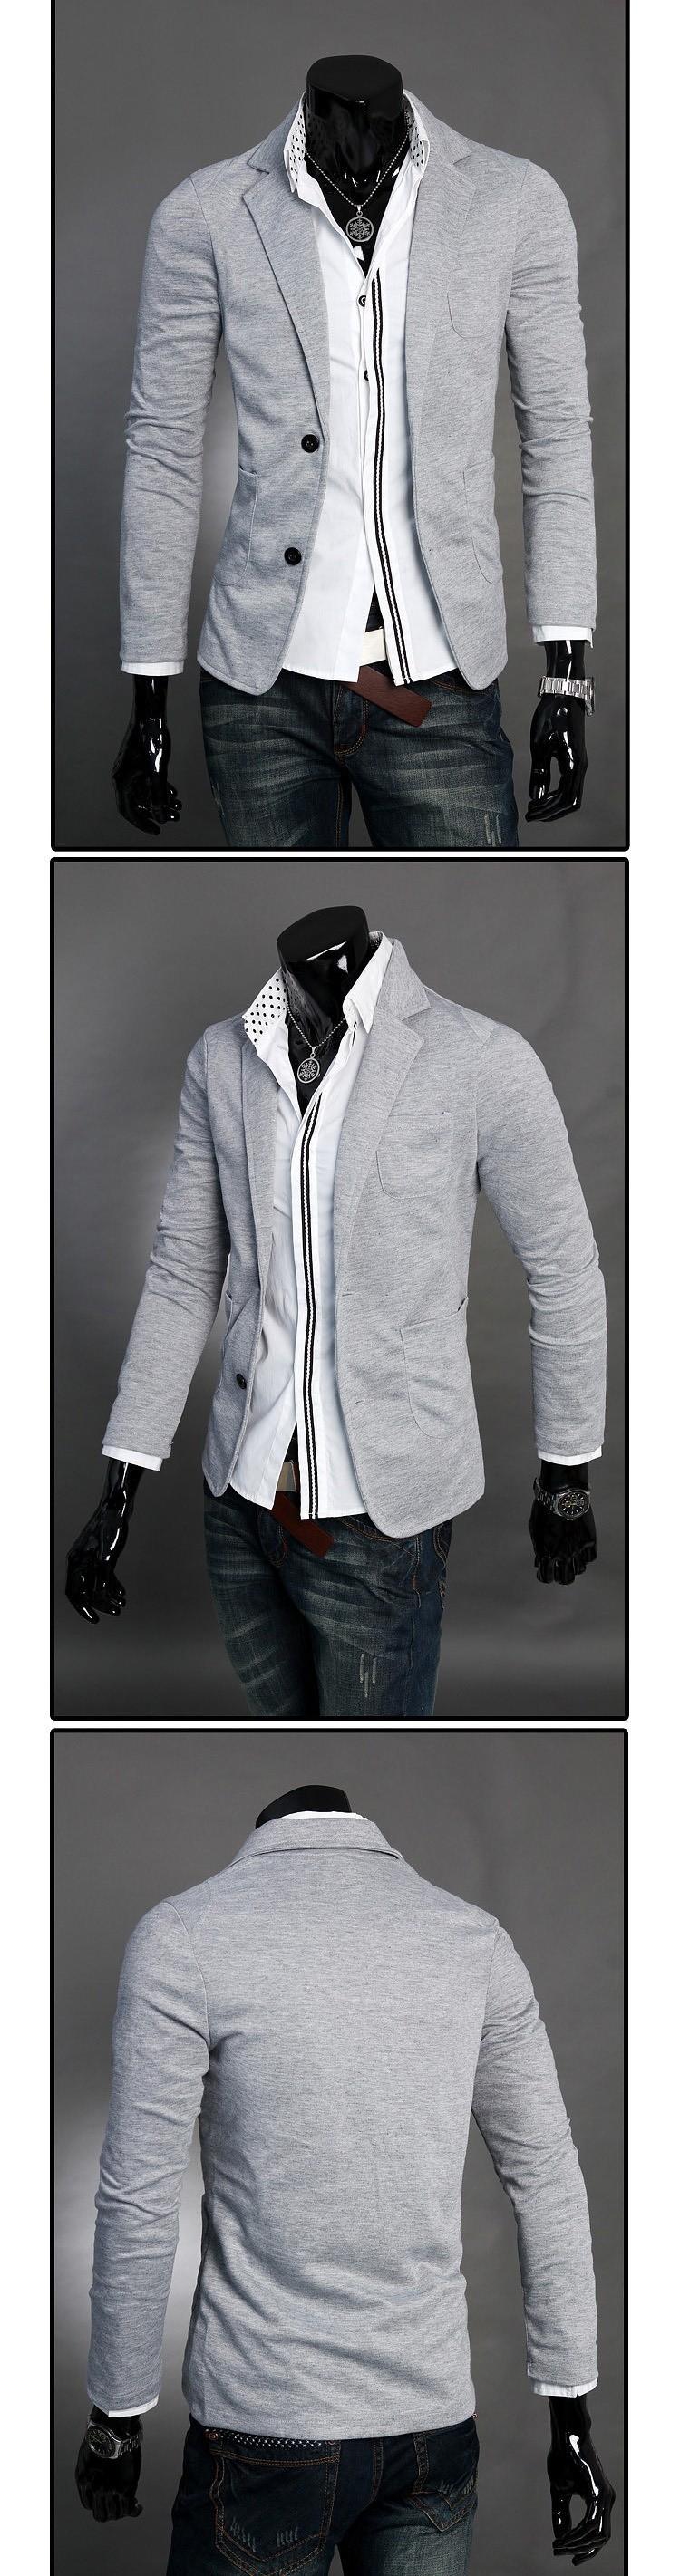 Мужской блейзер slim fit abrigos hombre homme chaqueta desigual new